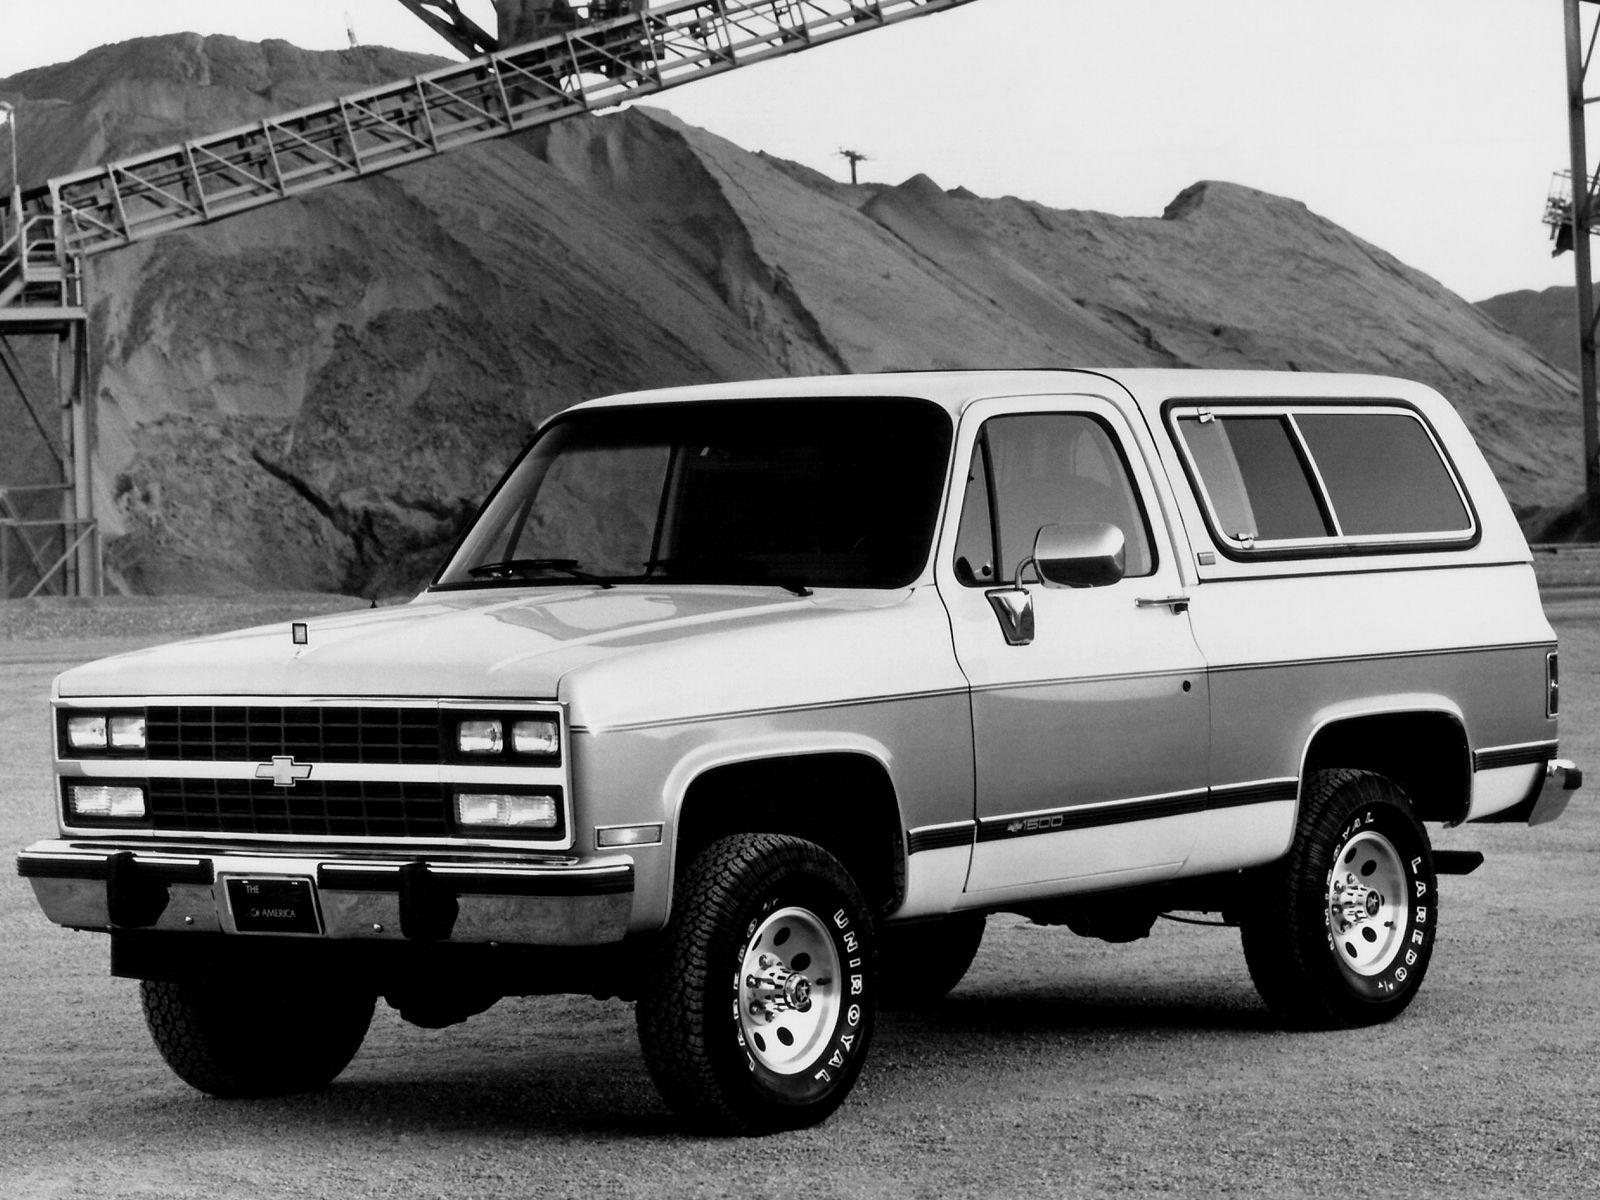 1990 Chevrolet Blazer Chevy K5 Blazer Chevrolet Blazer